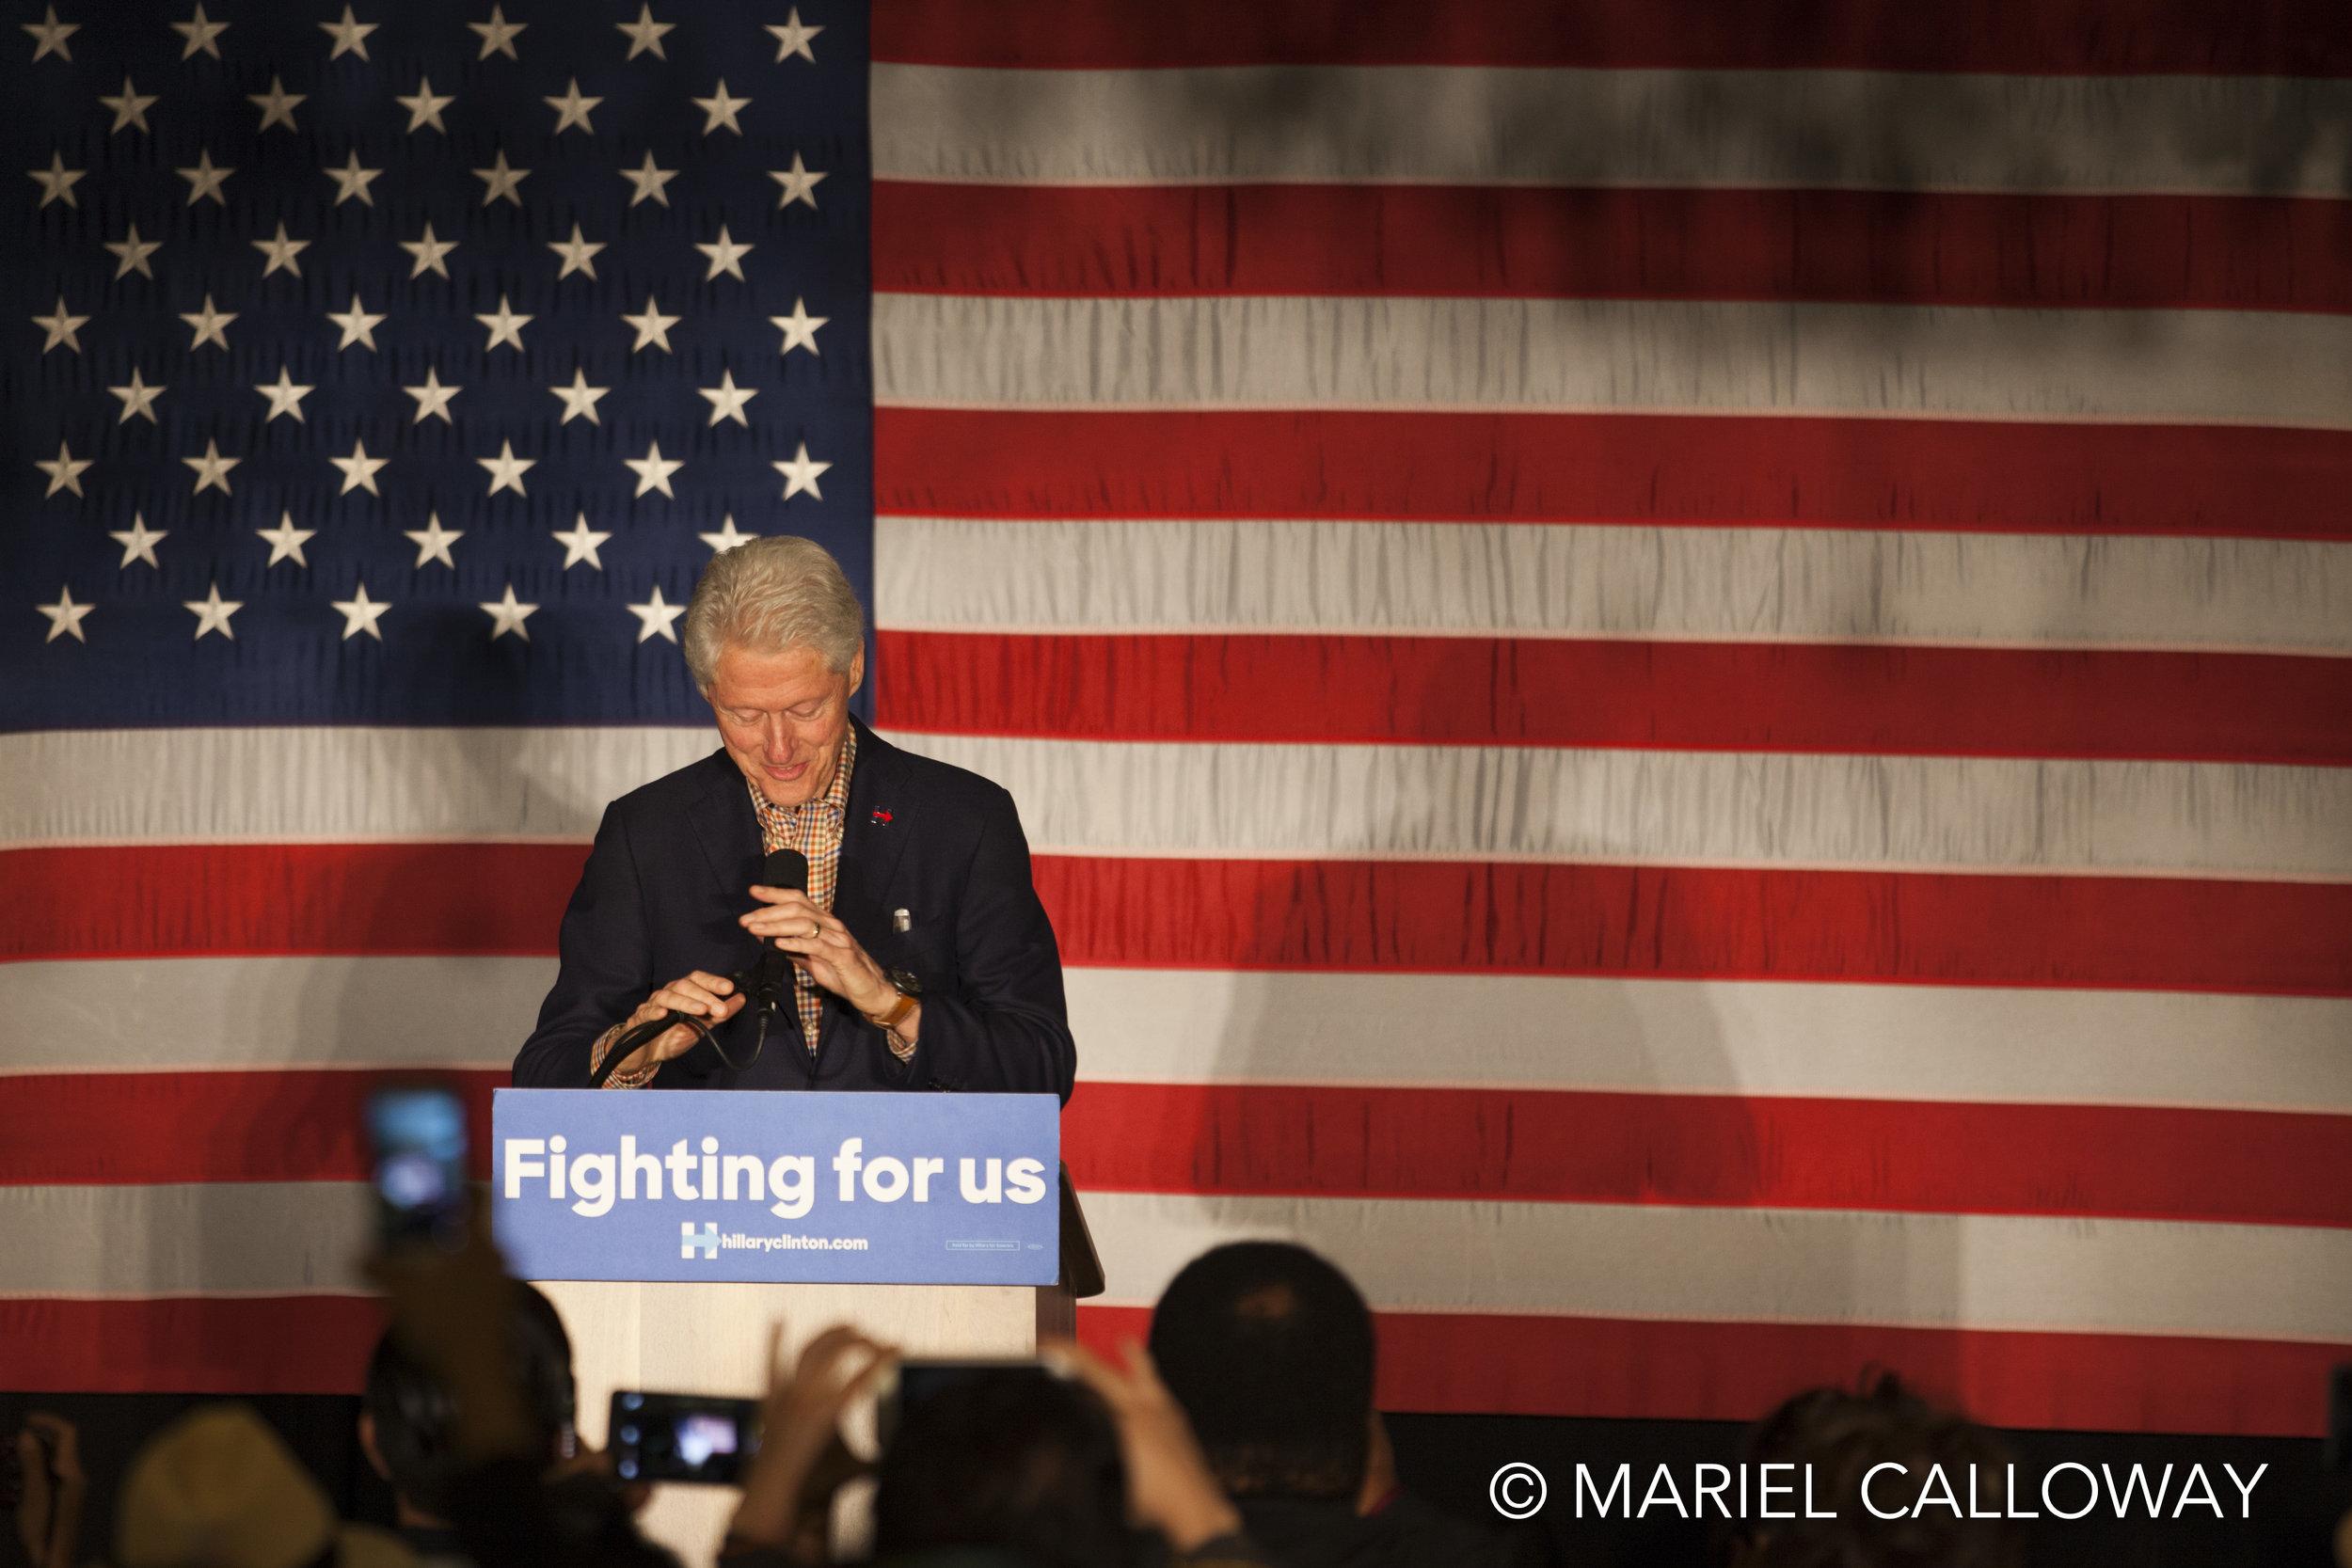 25_Bill-Clinton-Koreatown-Los-Angeles-050416-22.jpg